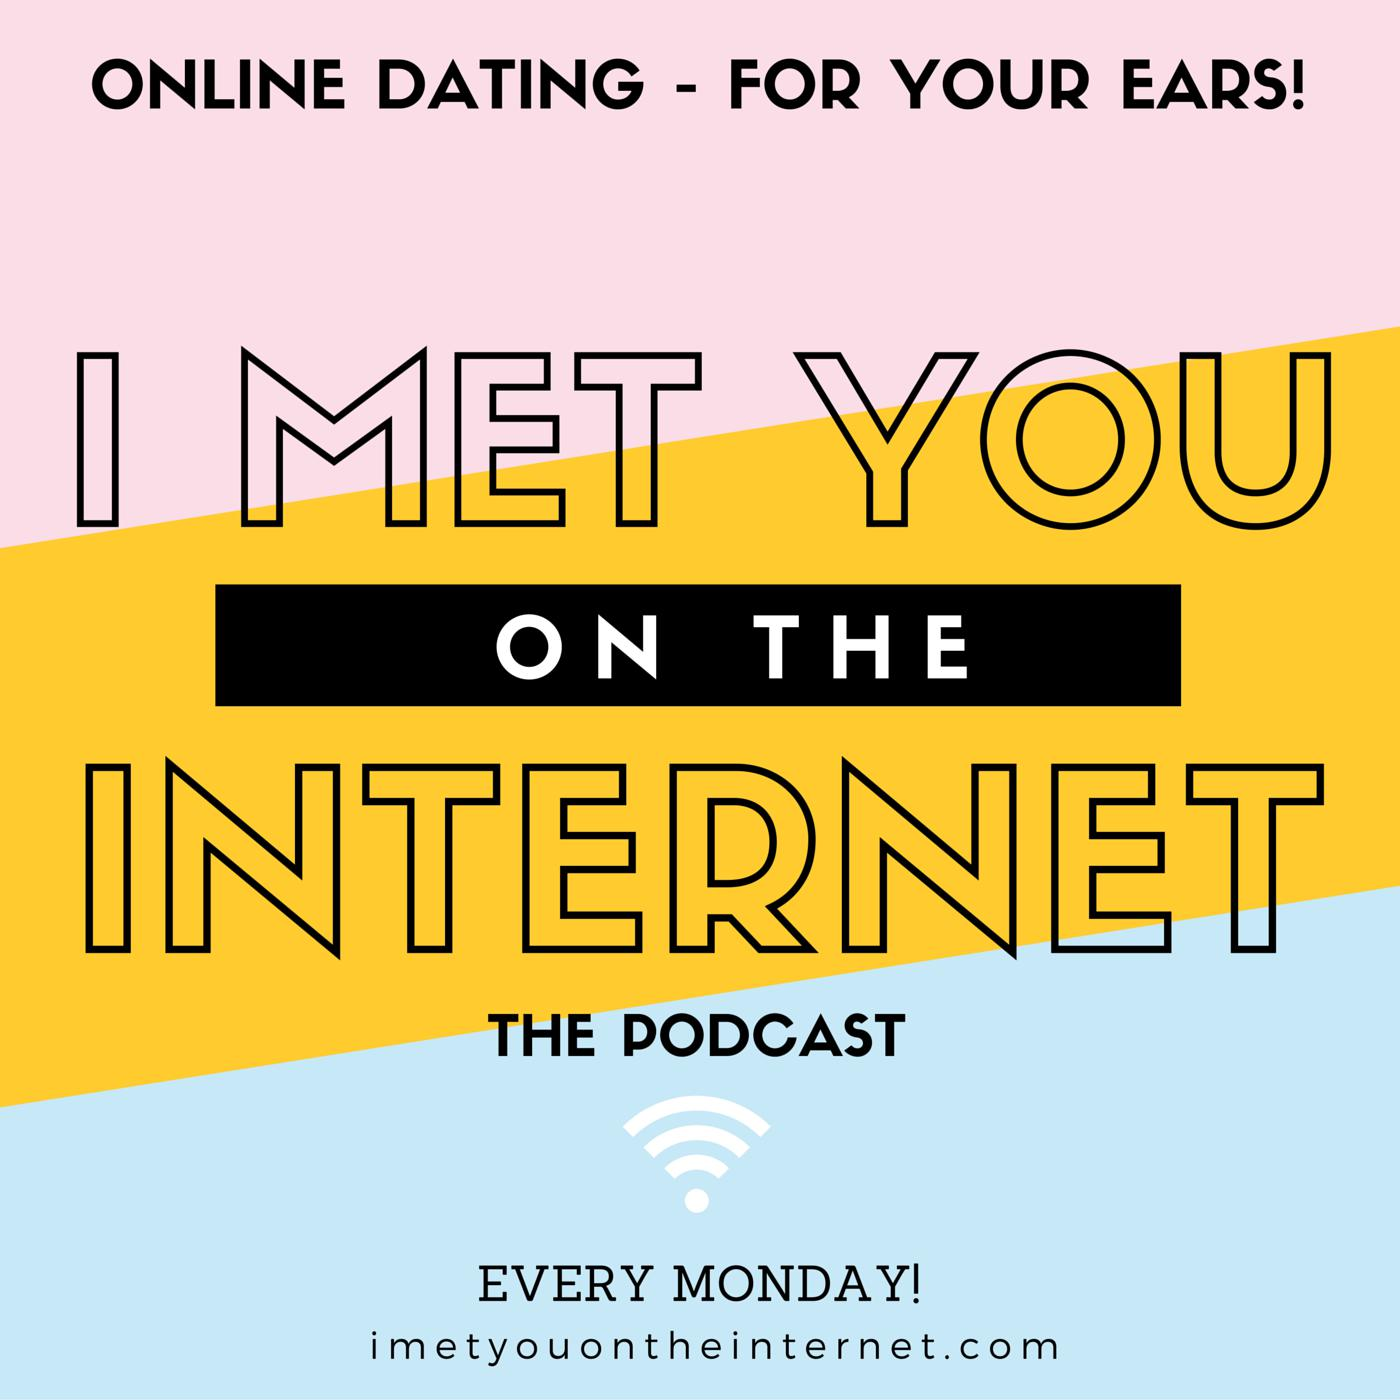 Internet dating podcast